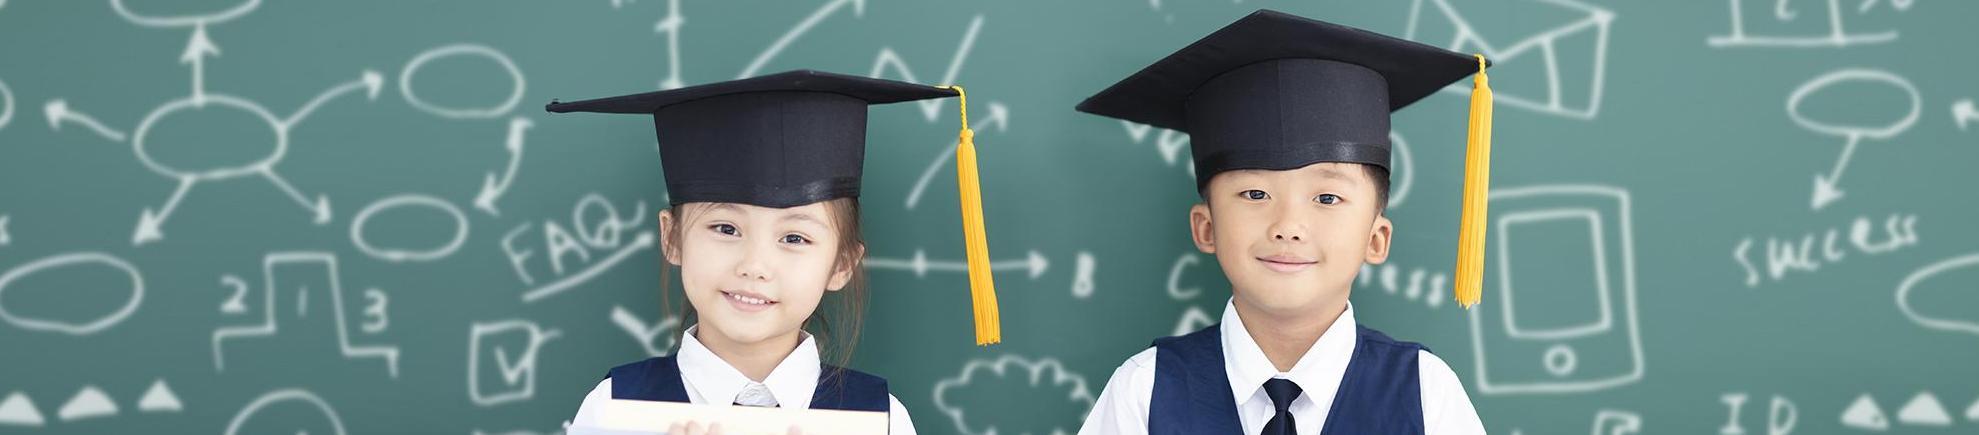 sas-japan-data-science-for-kids